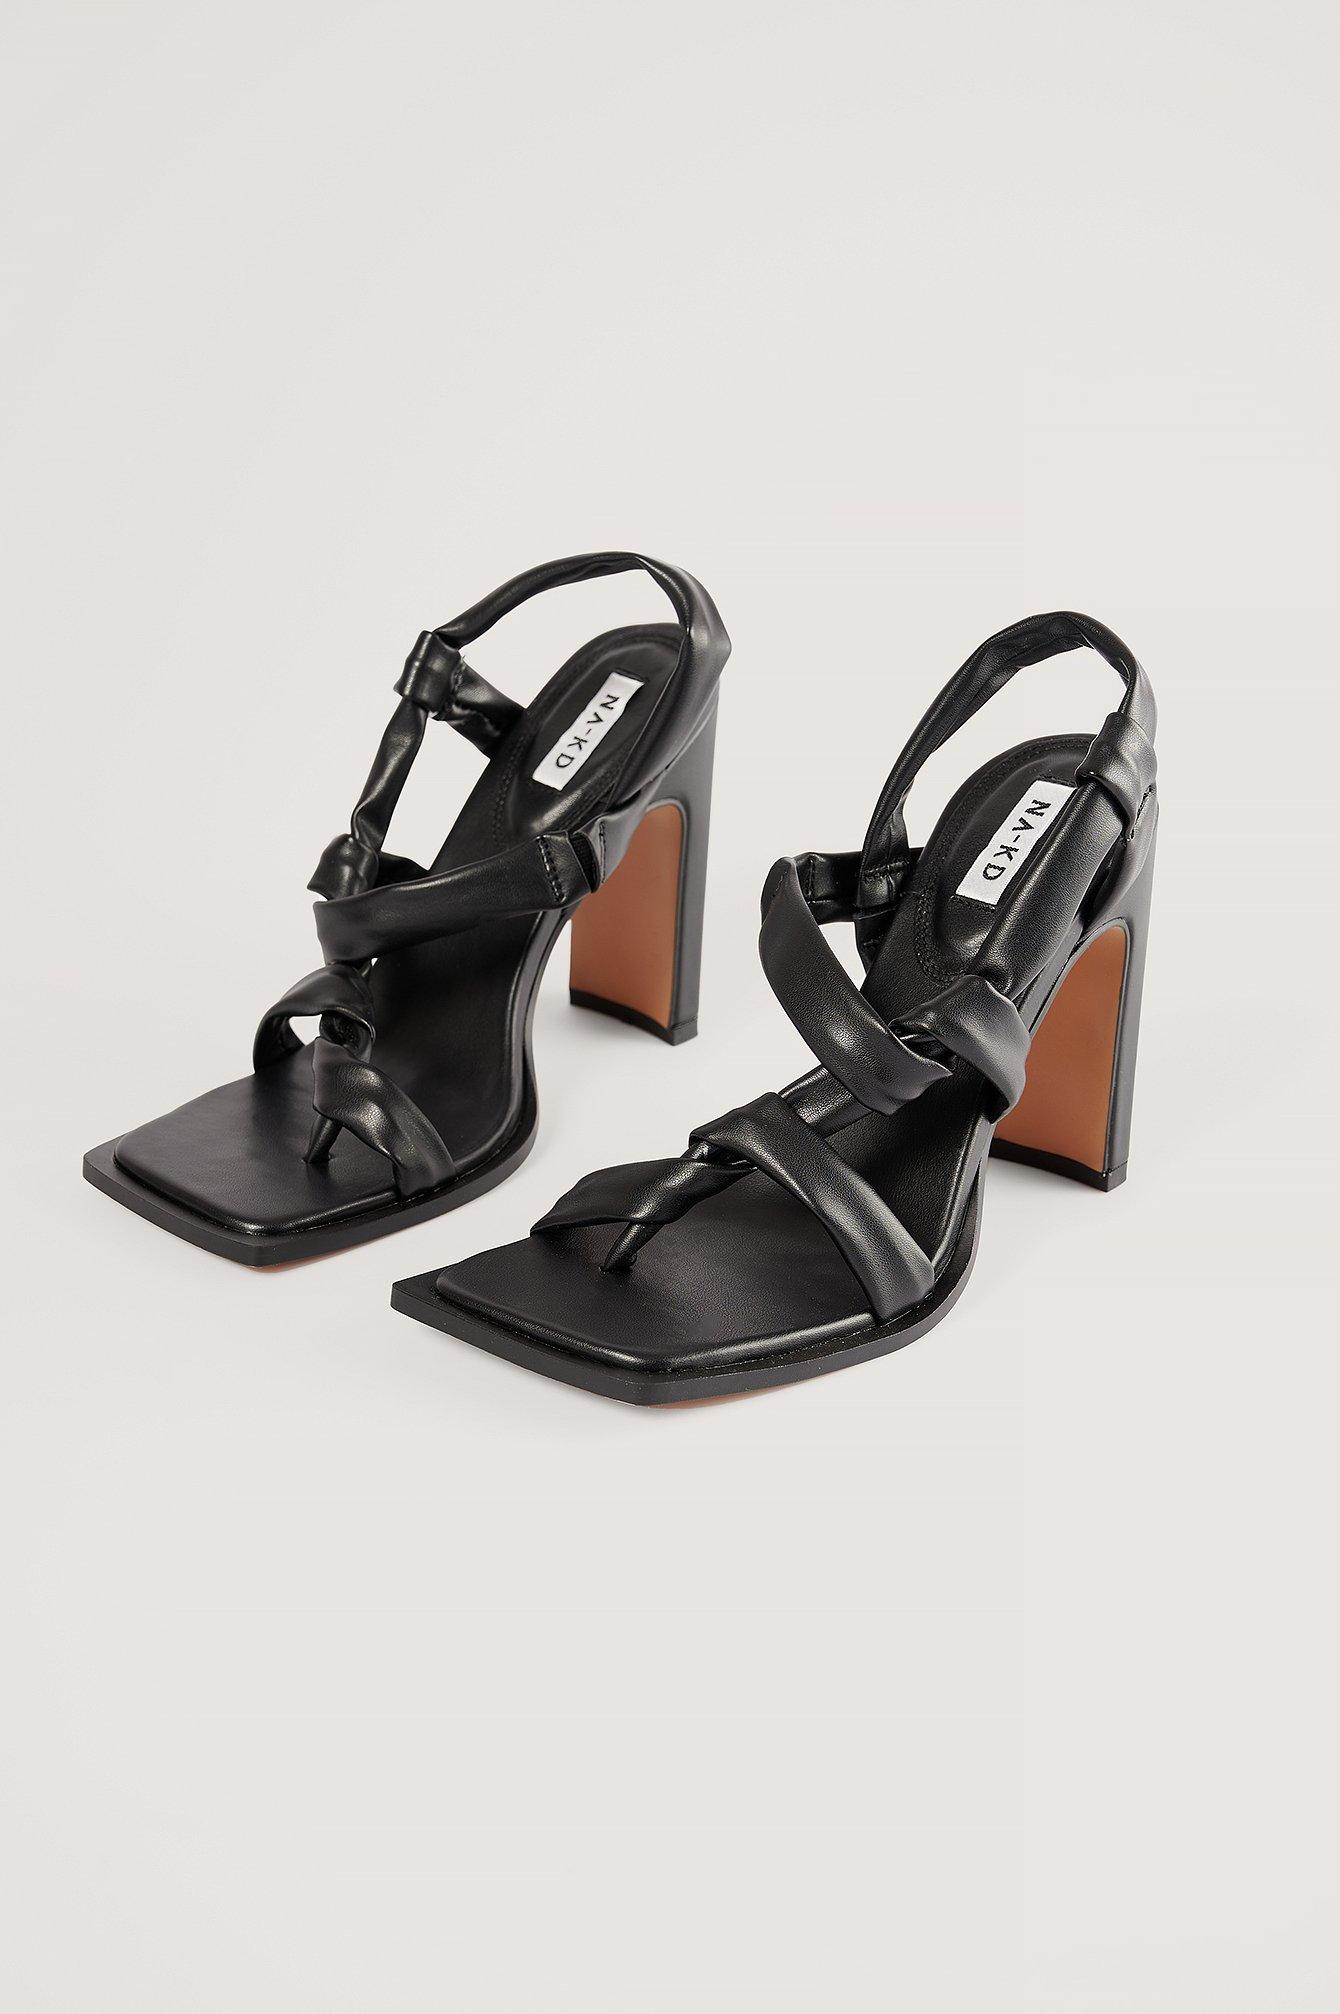 na-kd shoes -  Absatzschuhe Mit Knoten - Black